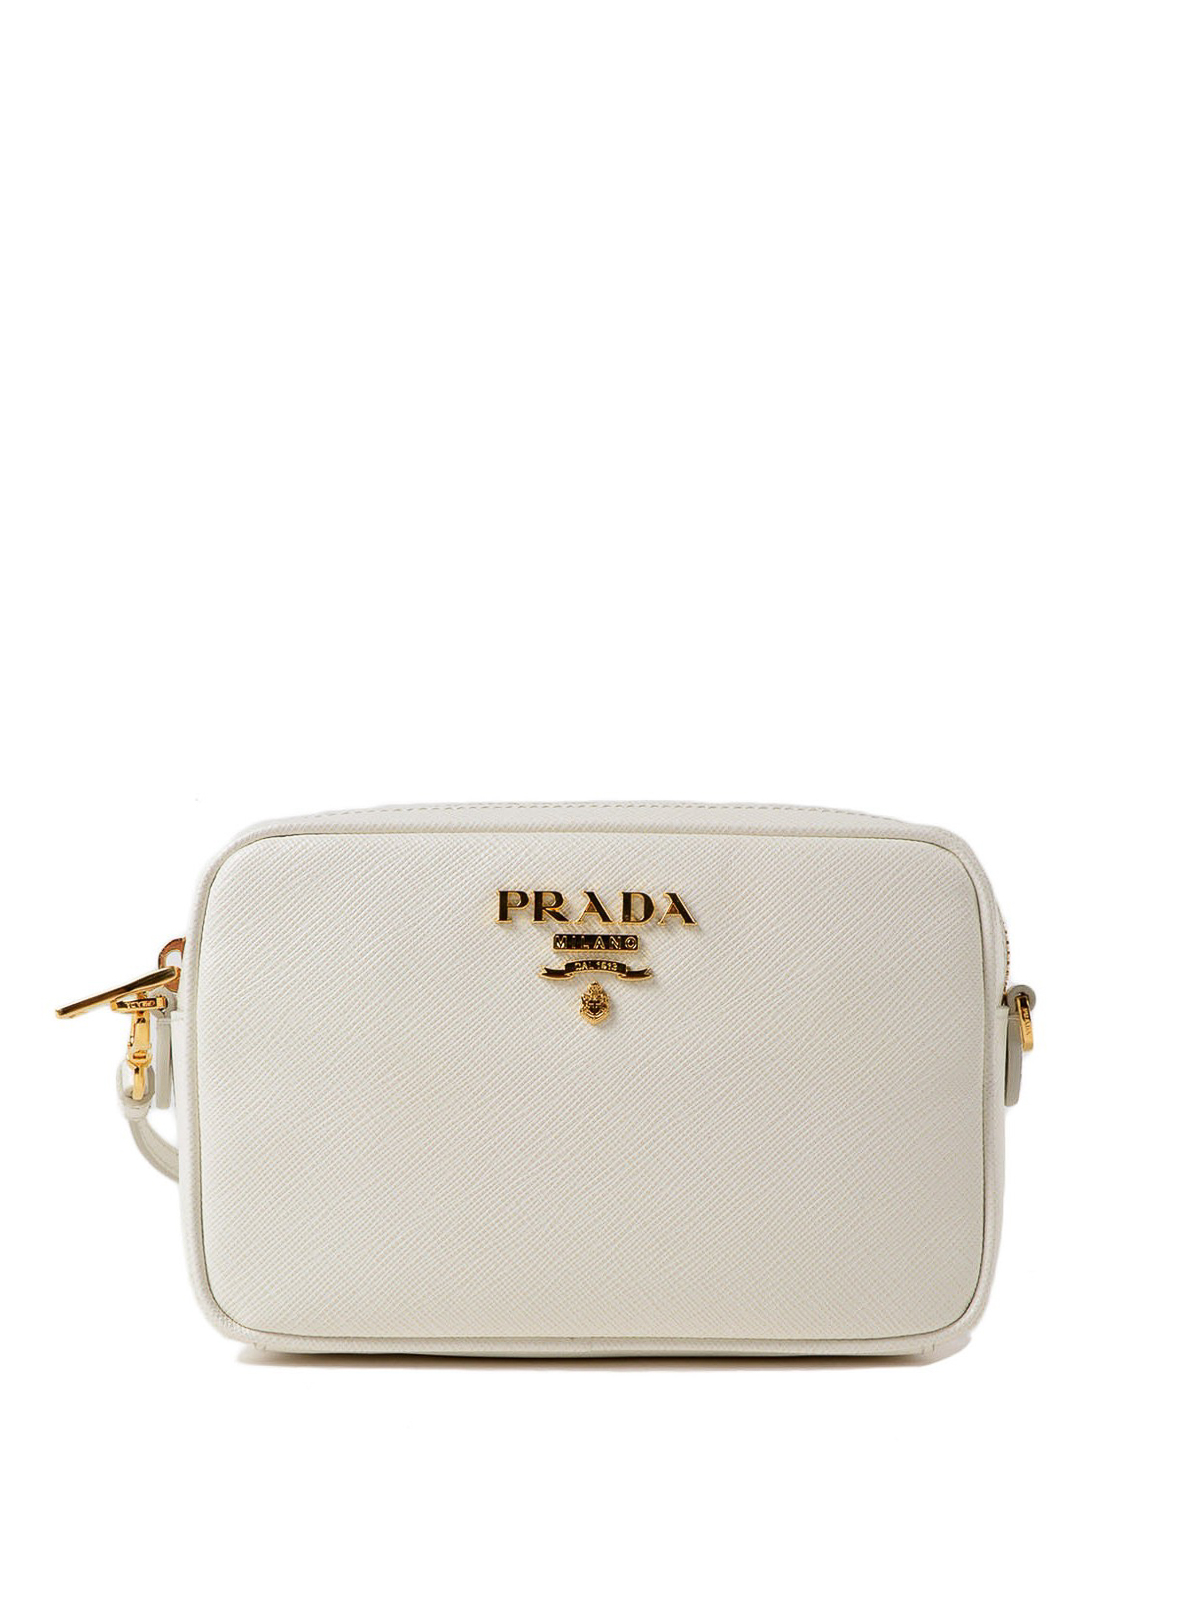 99b3cea3cebd Prada - White saffiano leather crossbody - cross body bags ...